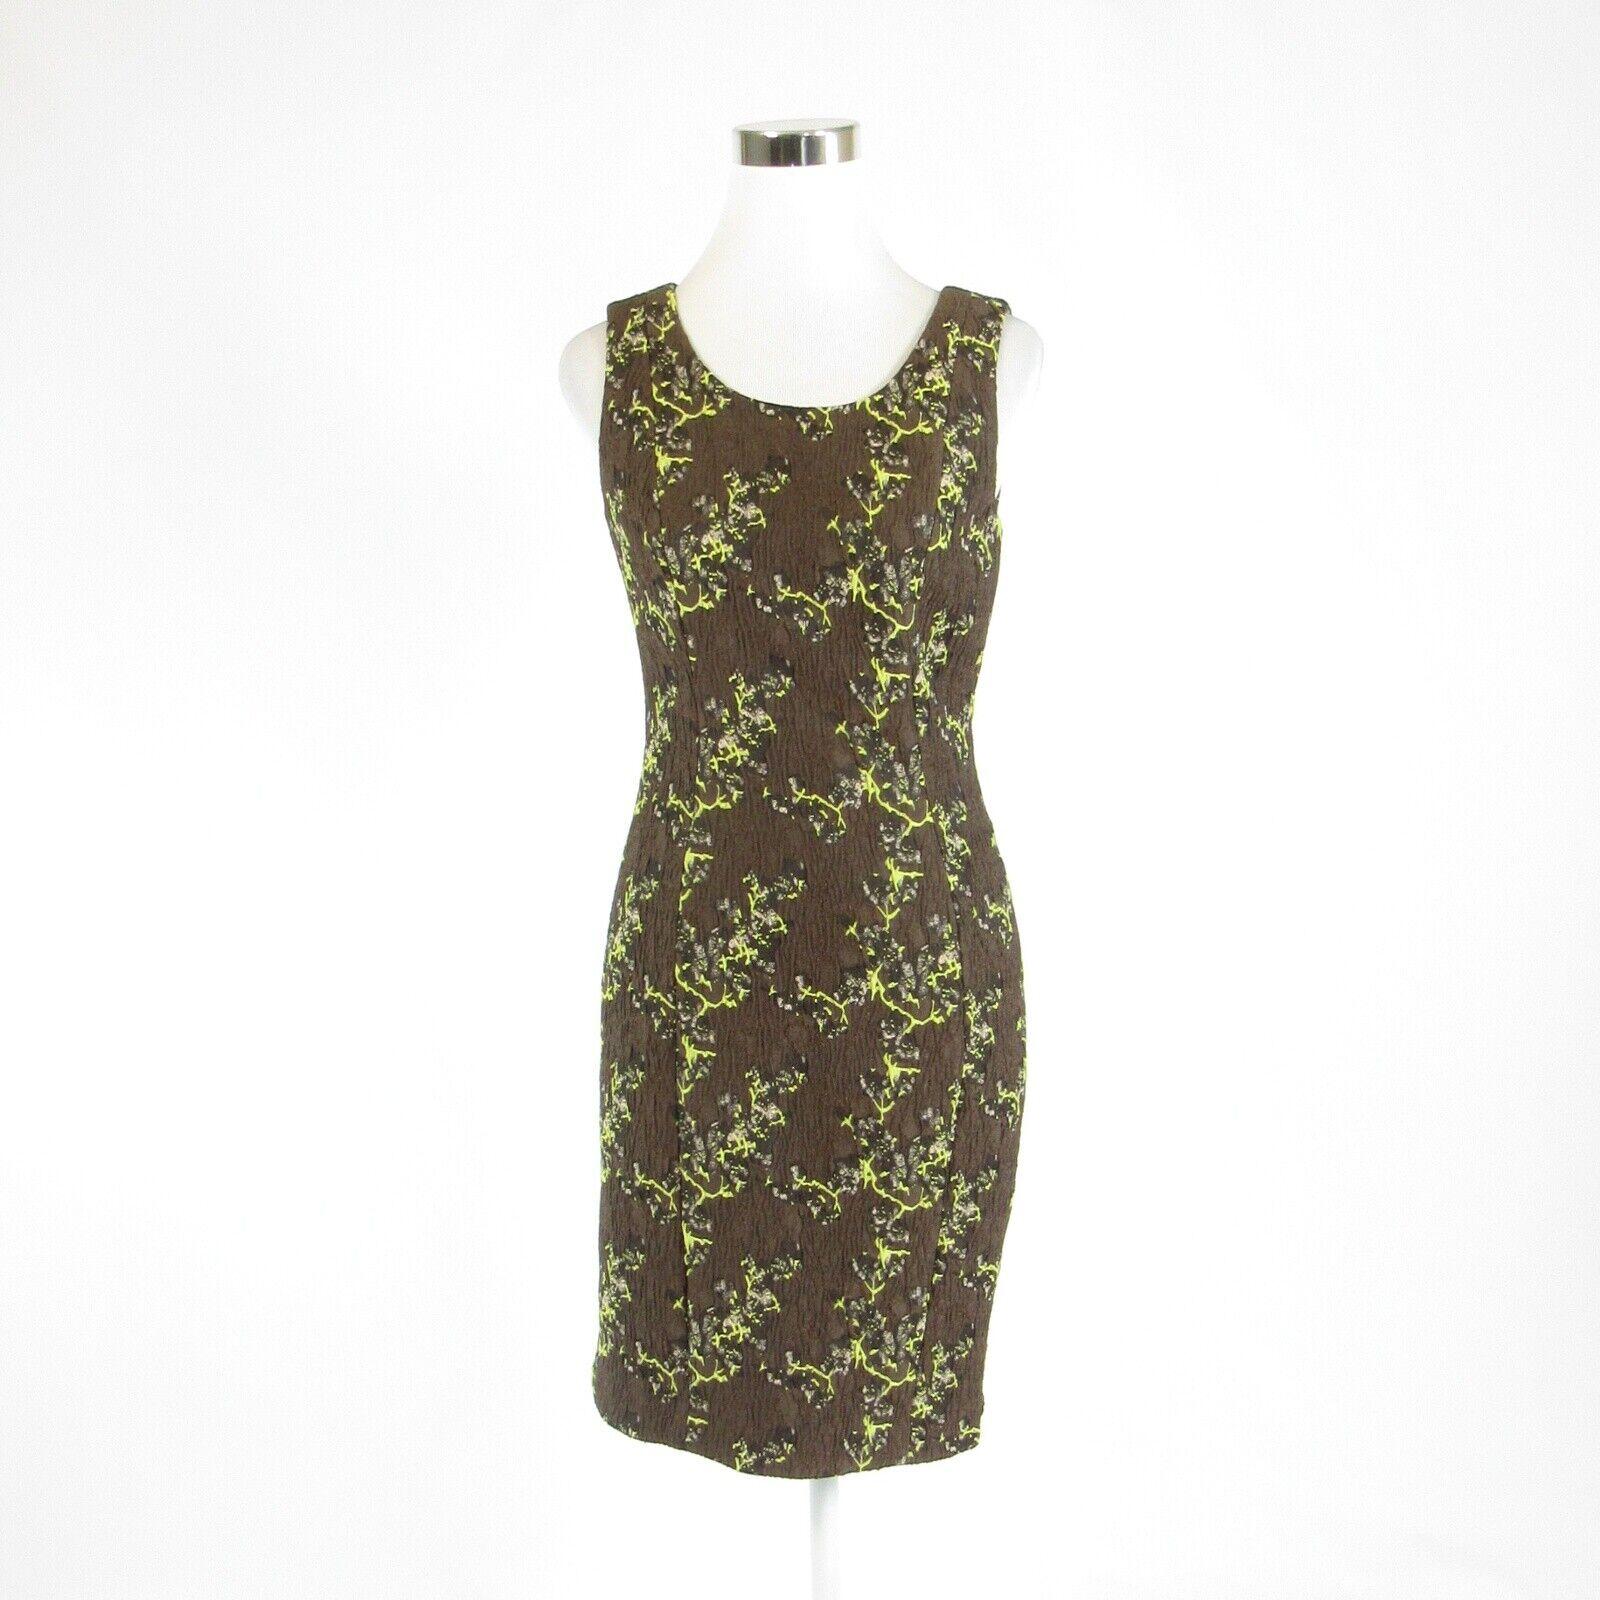 Brown green camouflage ETCETERA sleeveless sheath dress 2